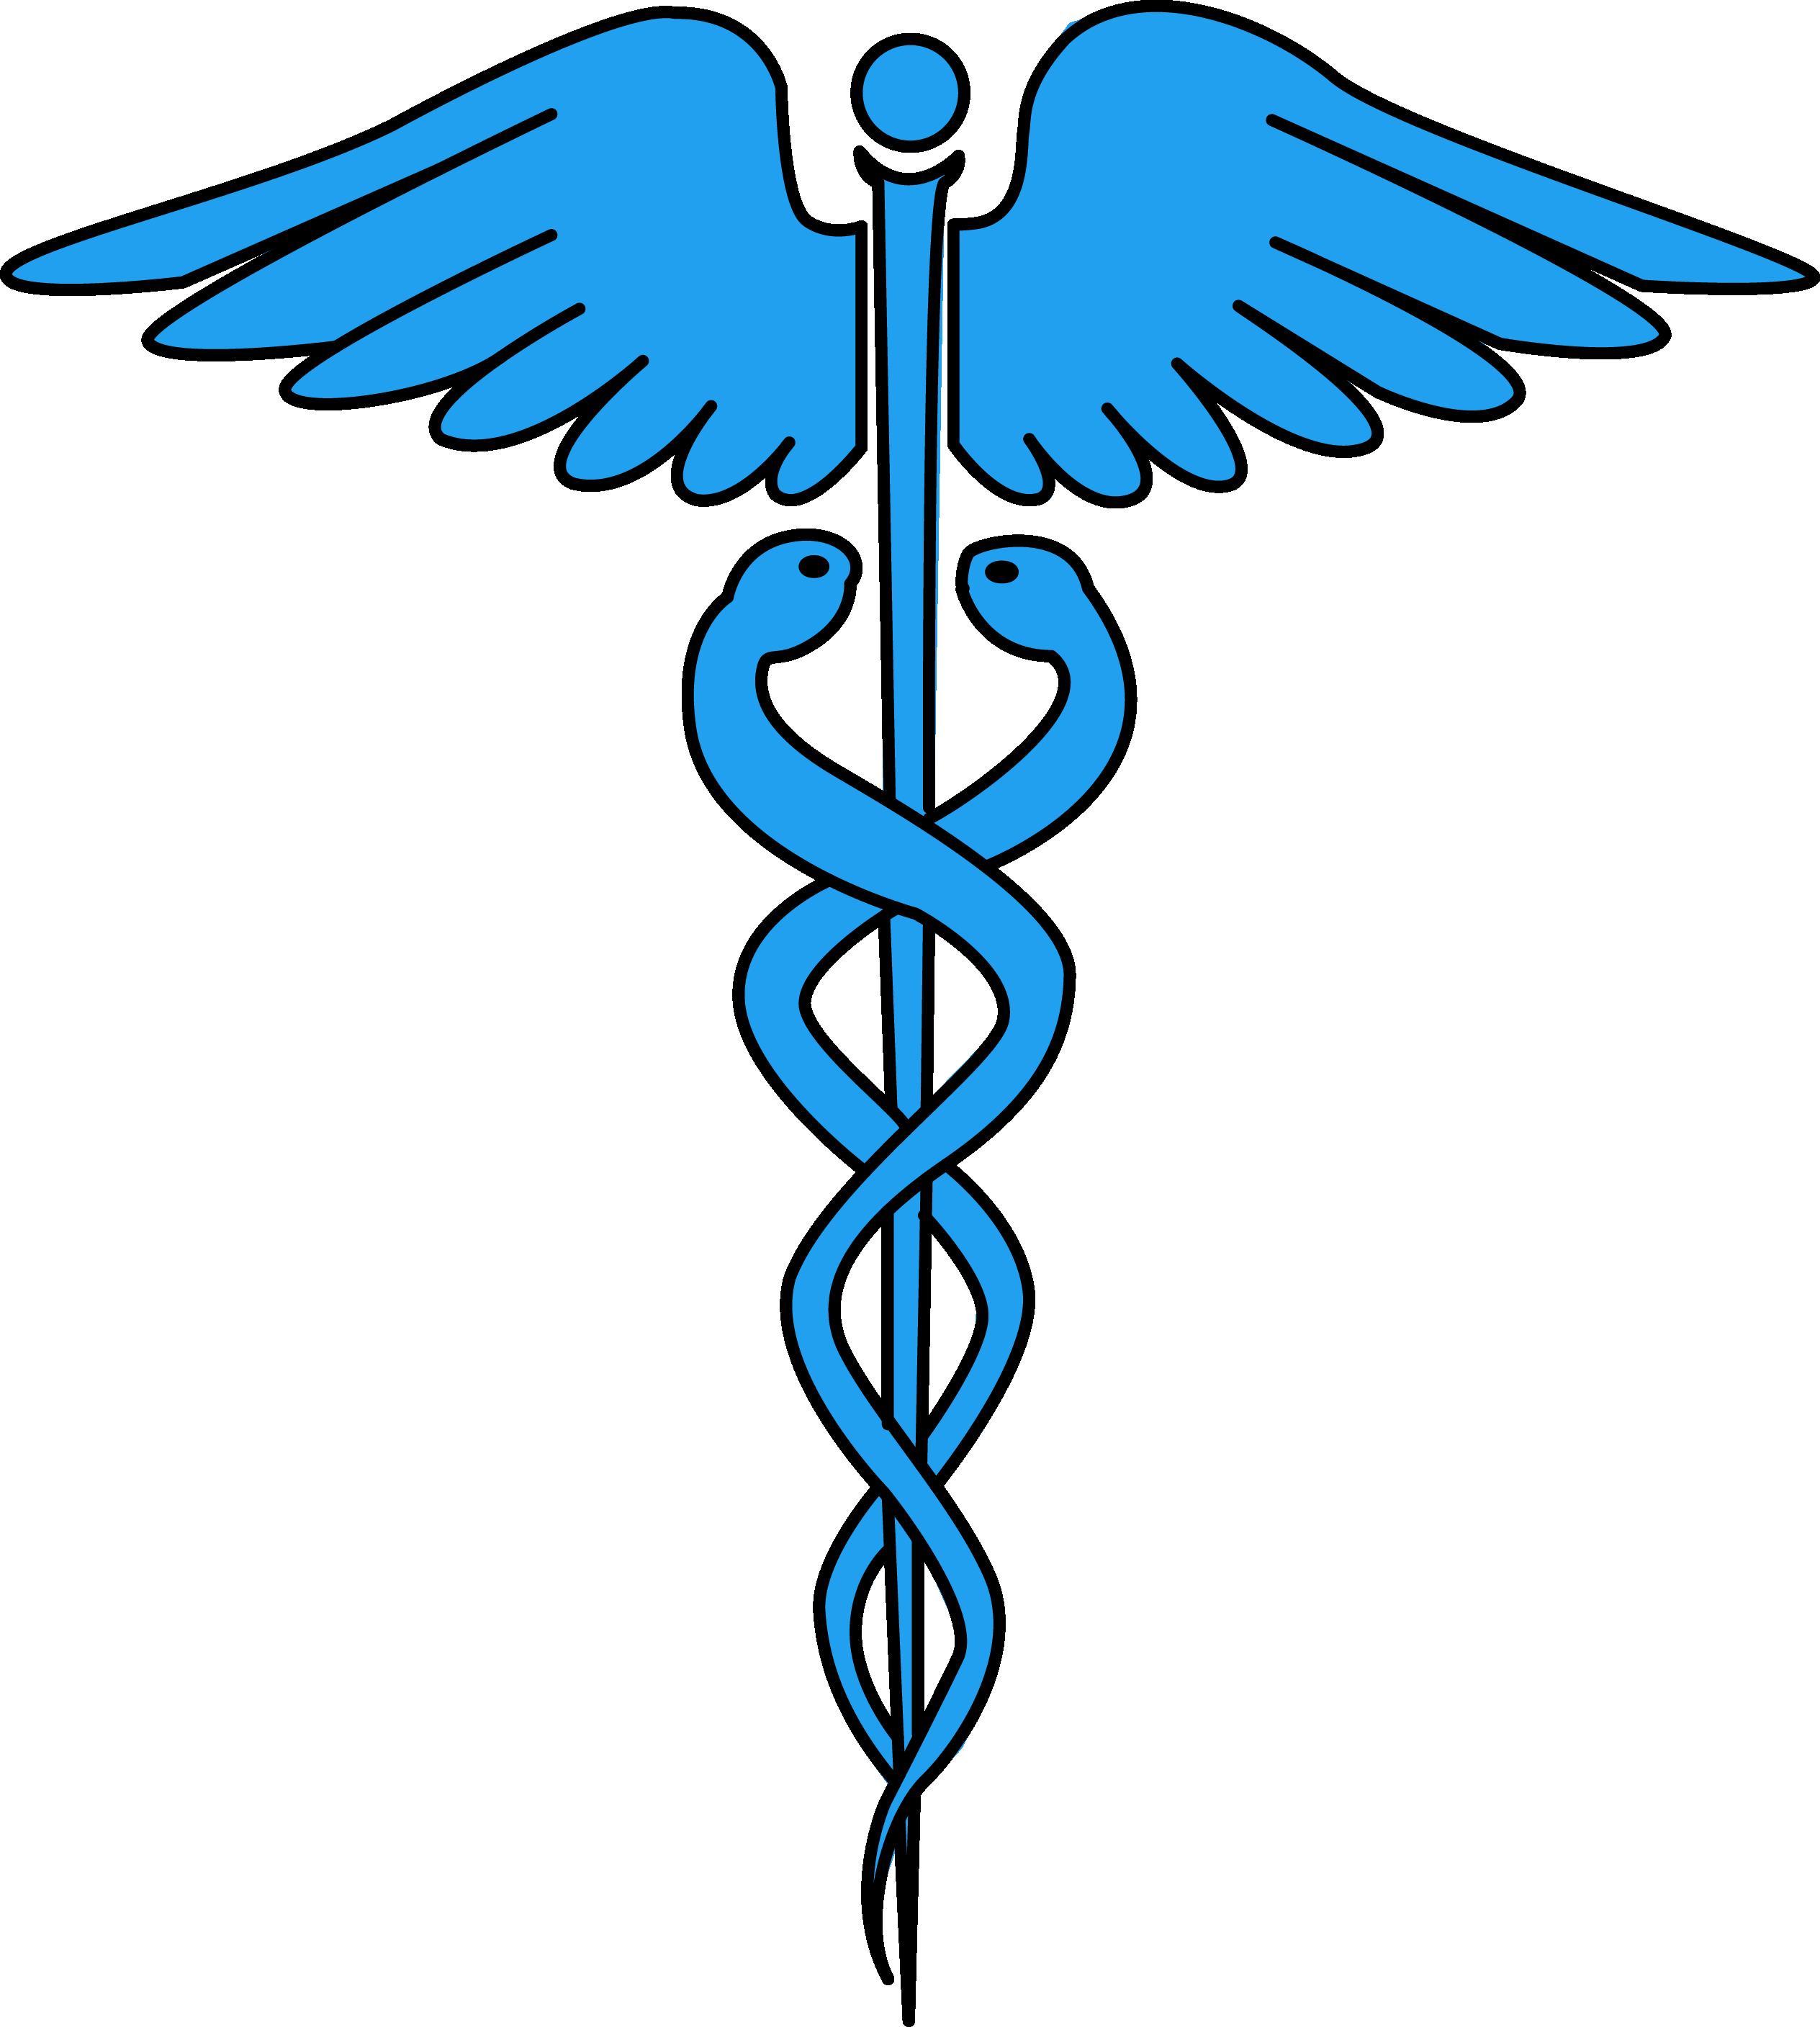 Image For Free Caduceus Medical Symbol Health High - Caduceus Medical Symbol (2528x2815)